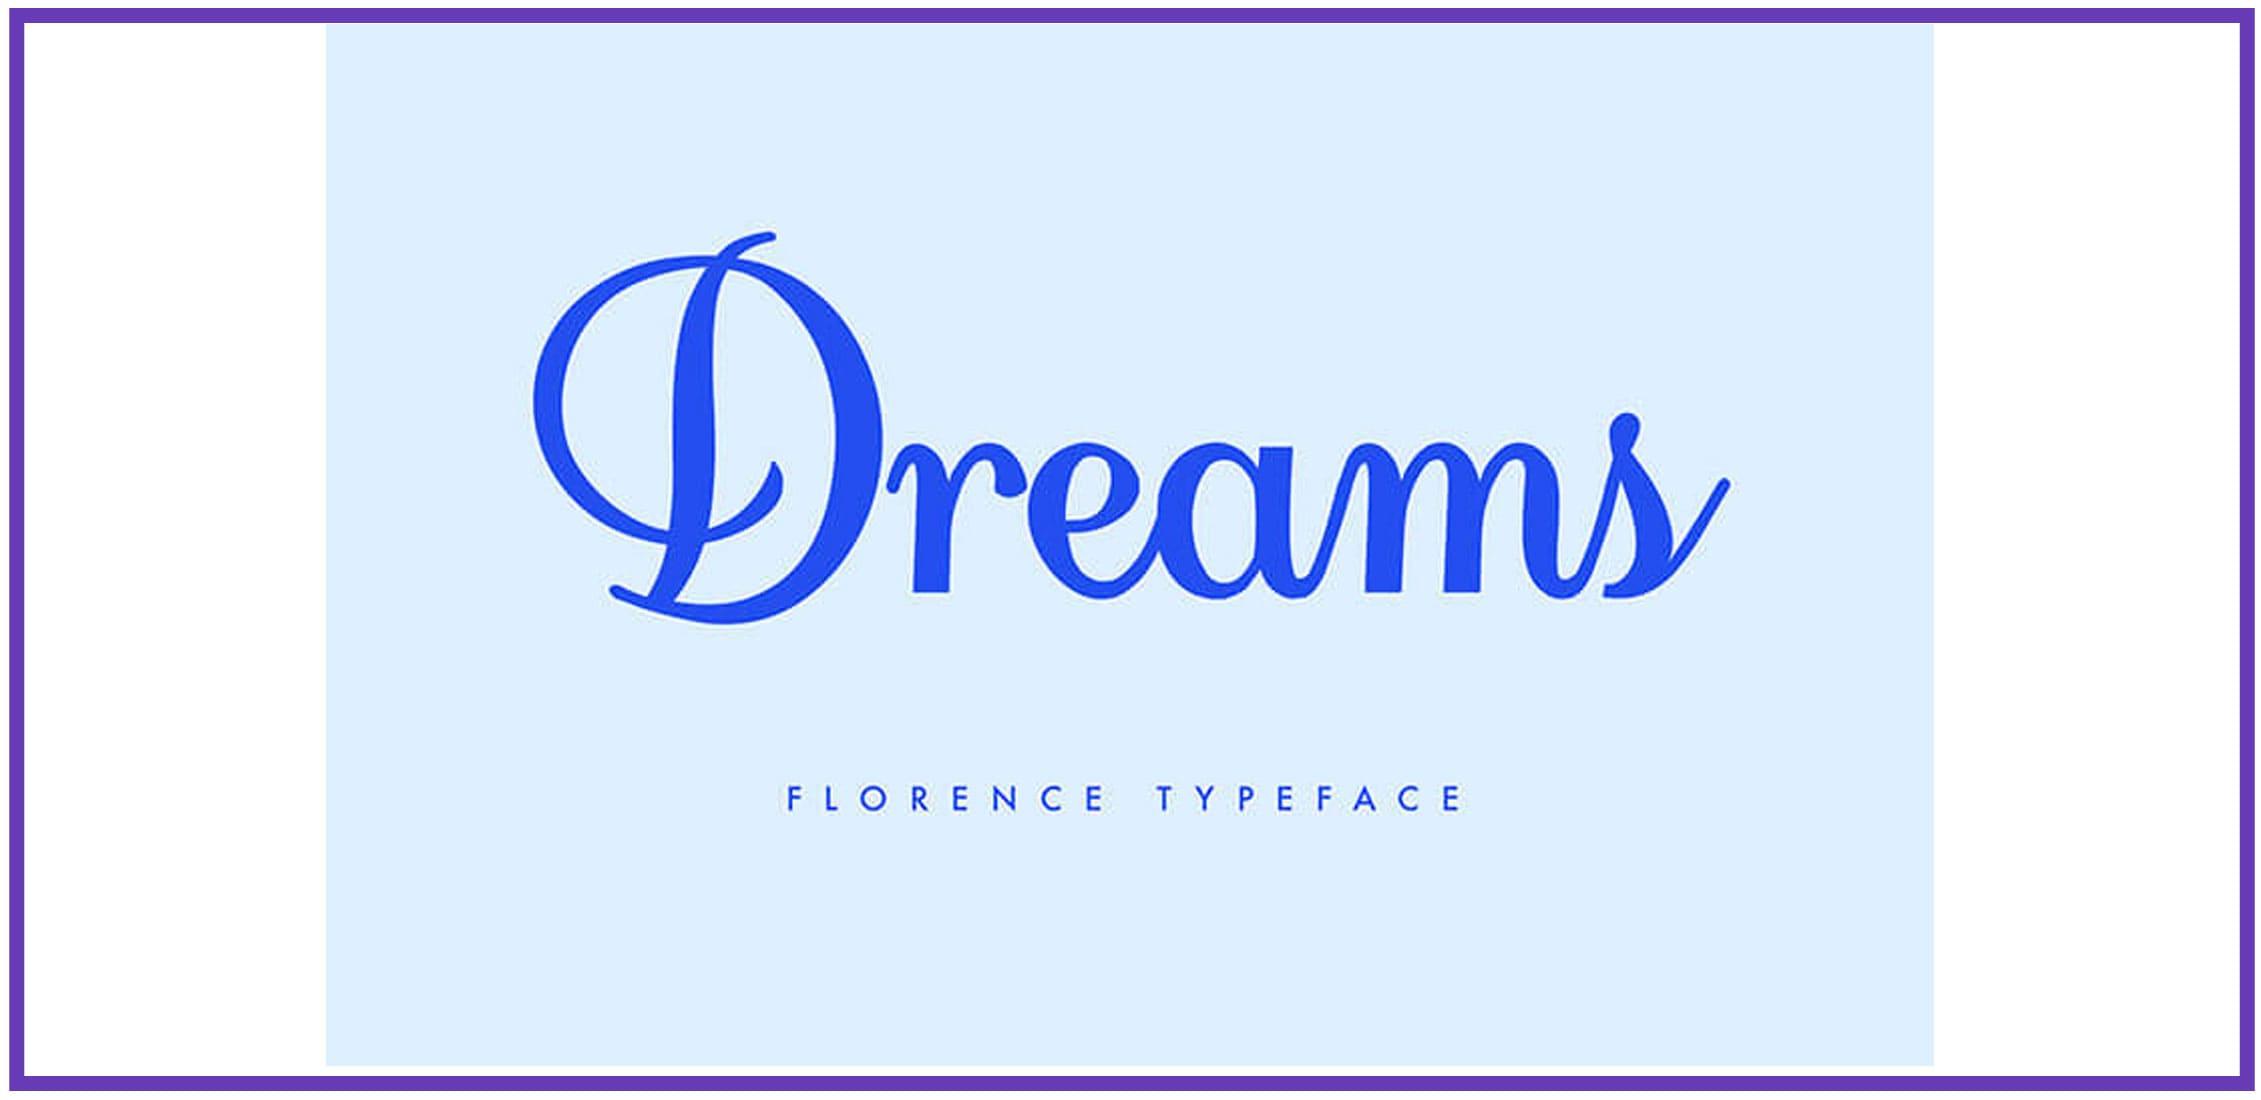 A script fun font on a light blue background.